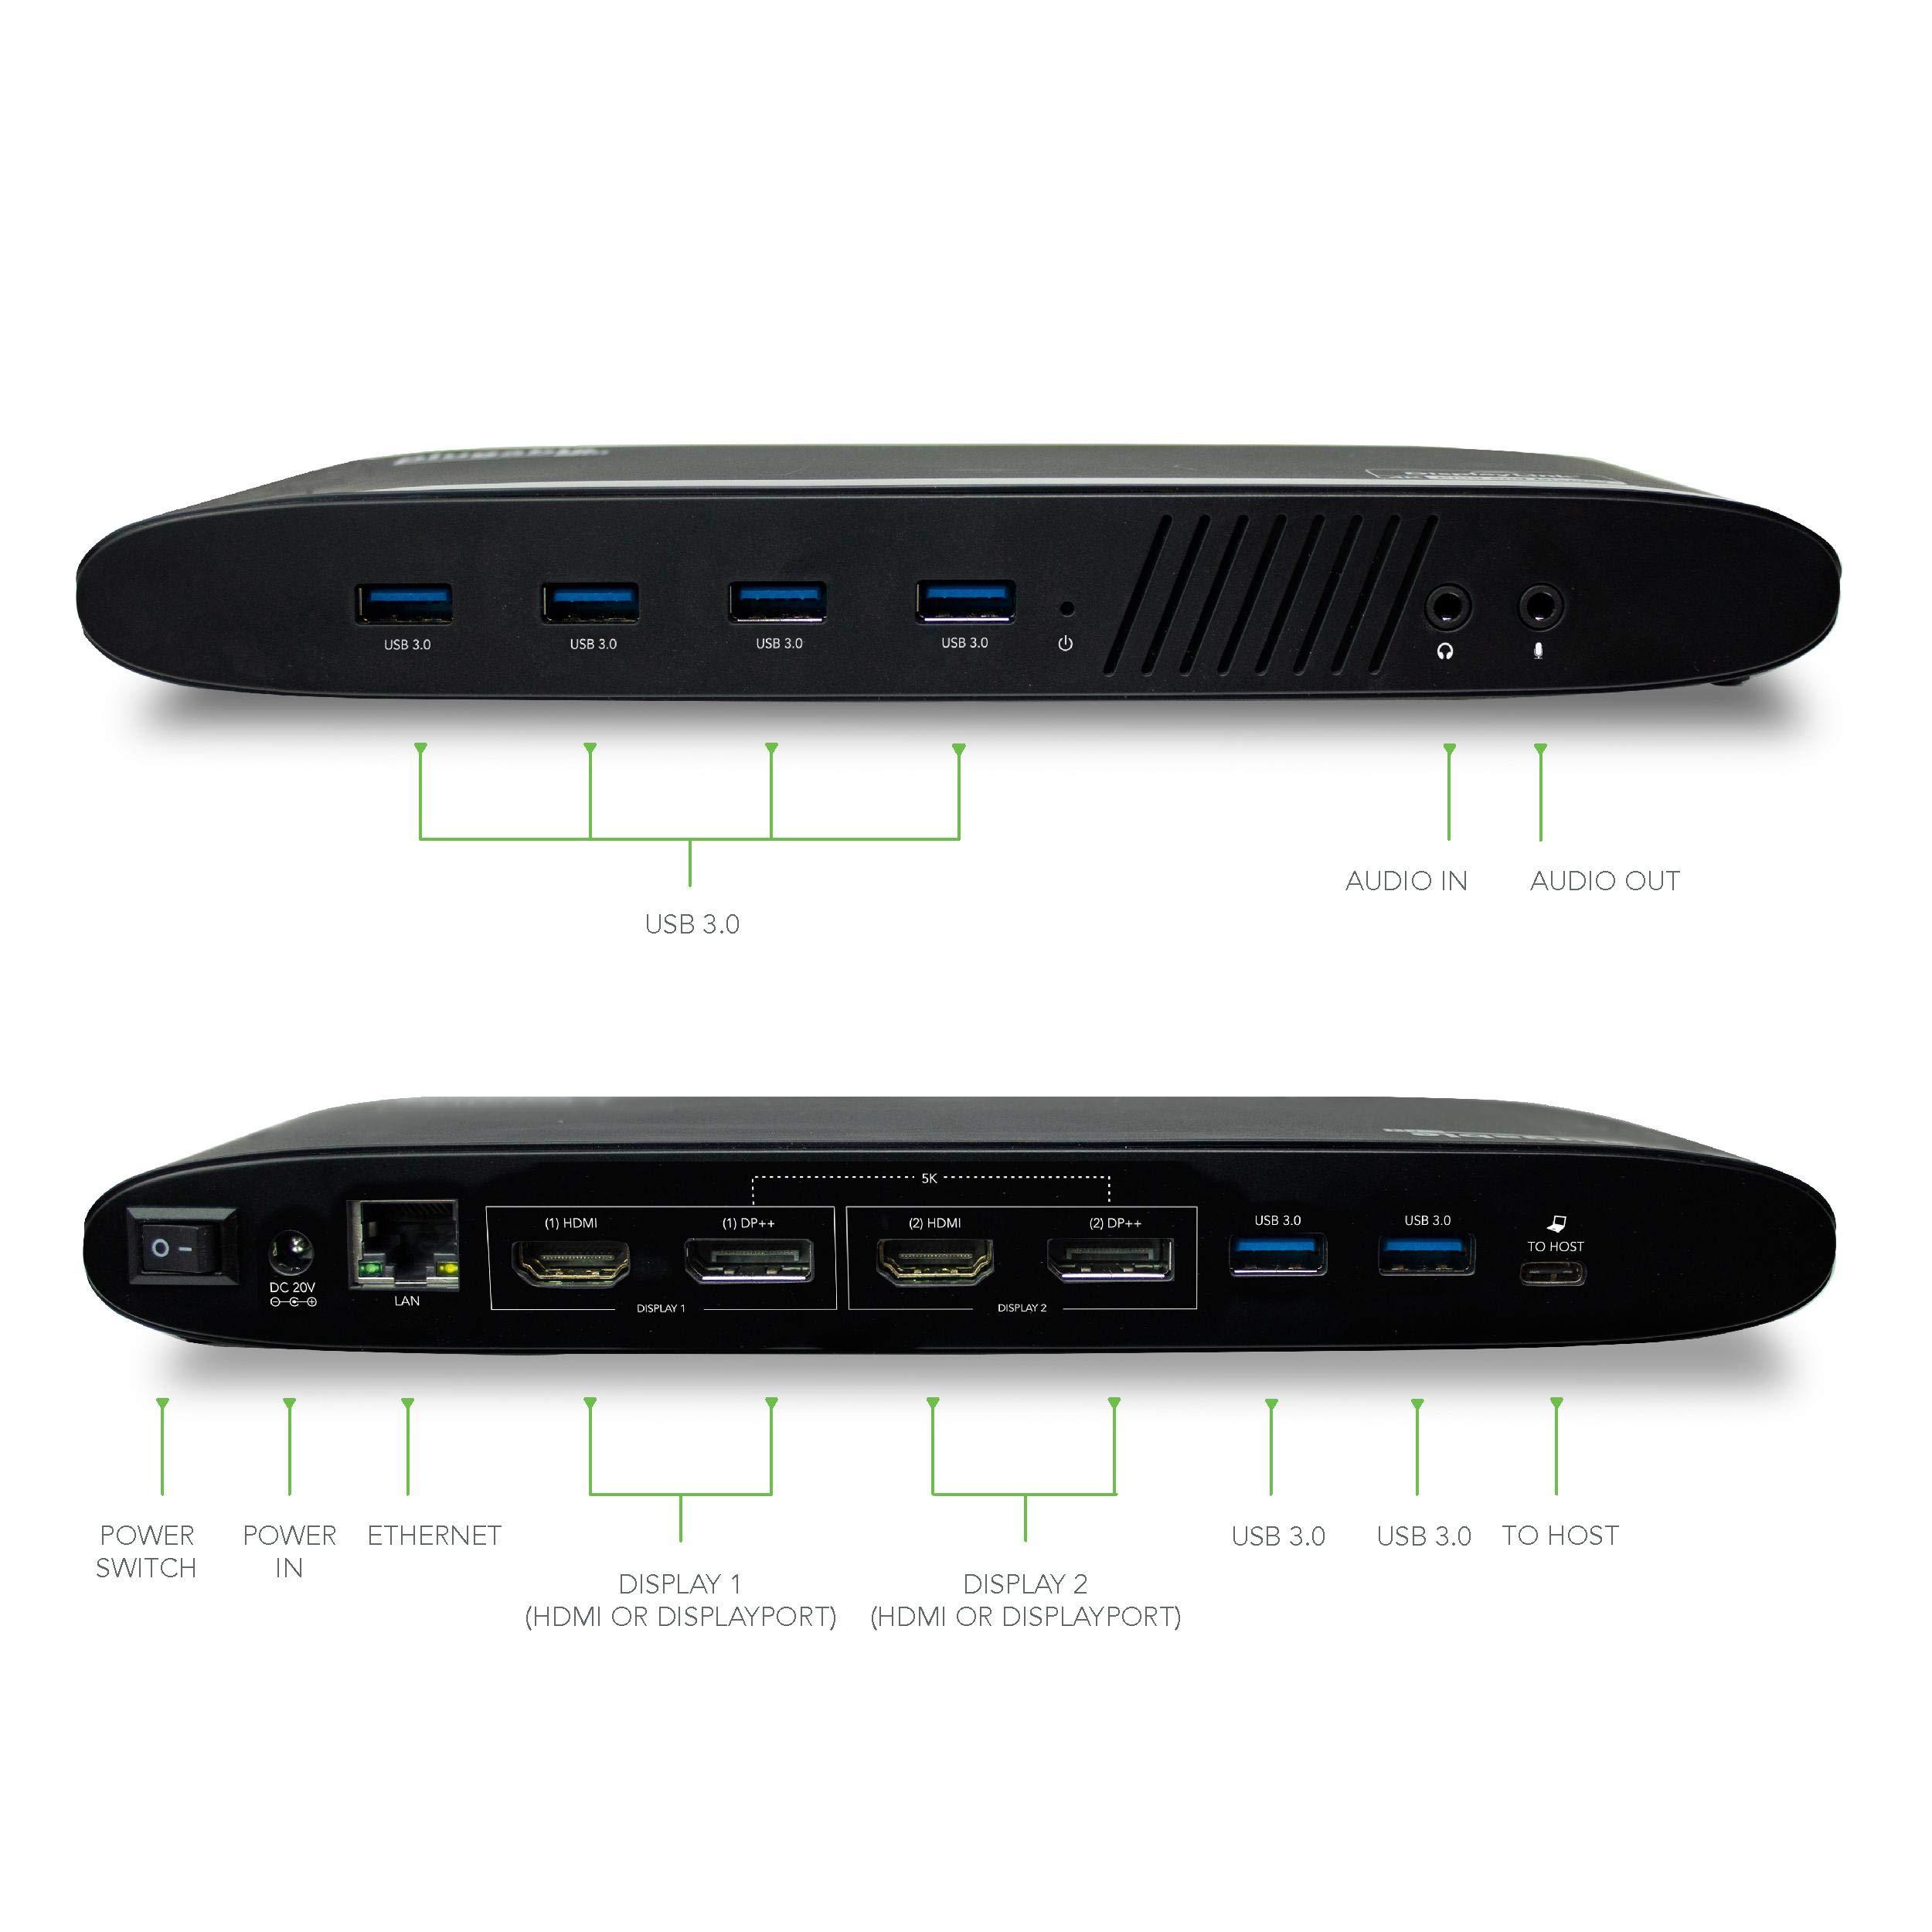 Plugable USB 3.0 Dual 4K Display Horizontal Docking Station with DisplayPort and HDMI for Windows (Dual 4K DisplayPort & HDMI, Gigabit Ethernet, Audio, 6 USB Ports) by Plugable (Image #5)